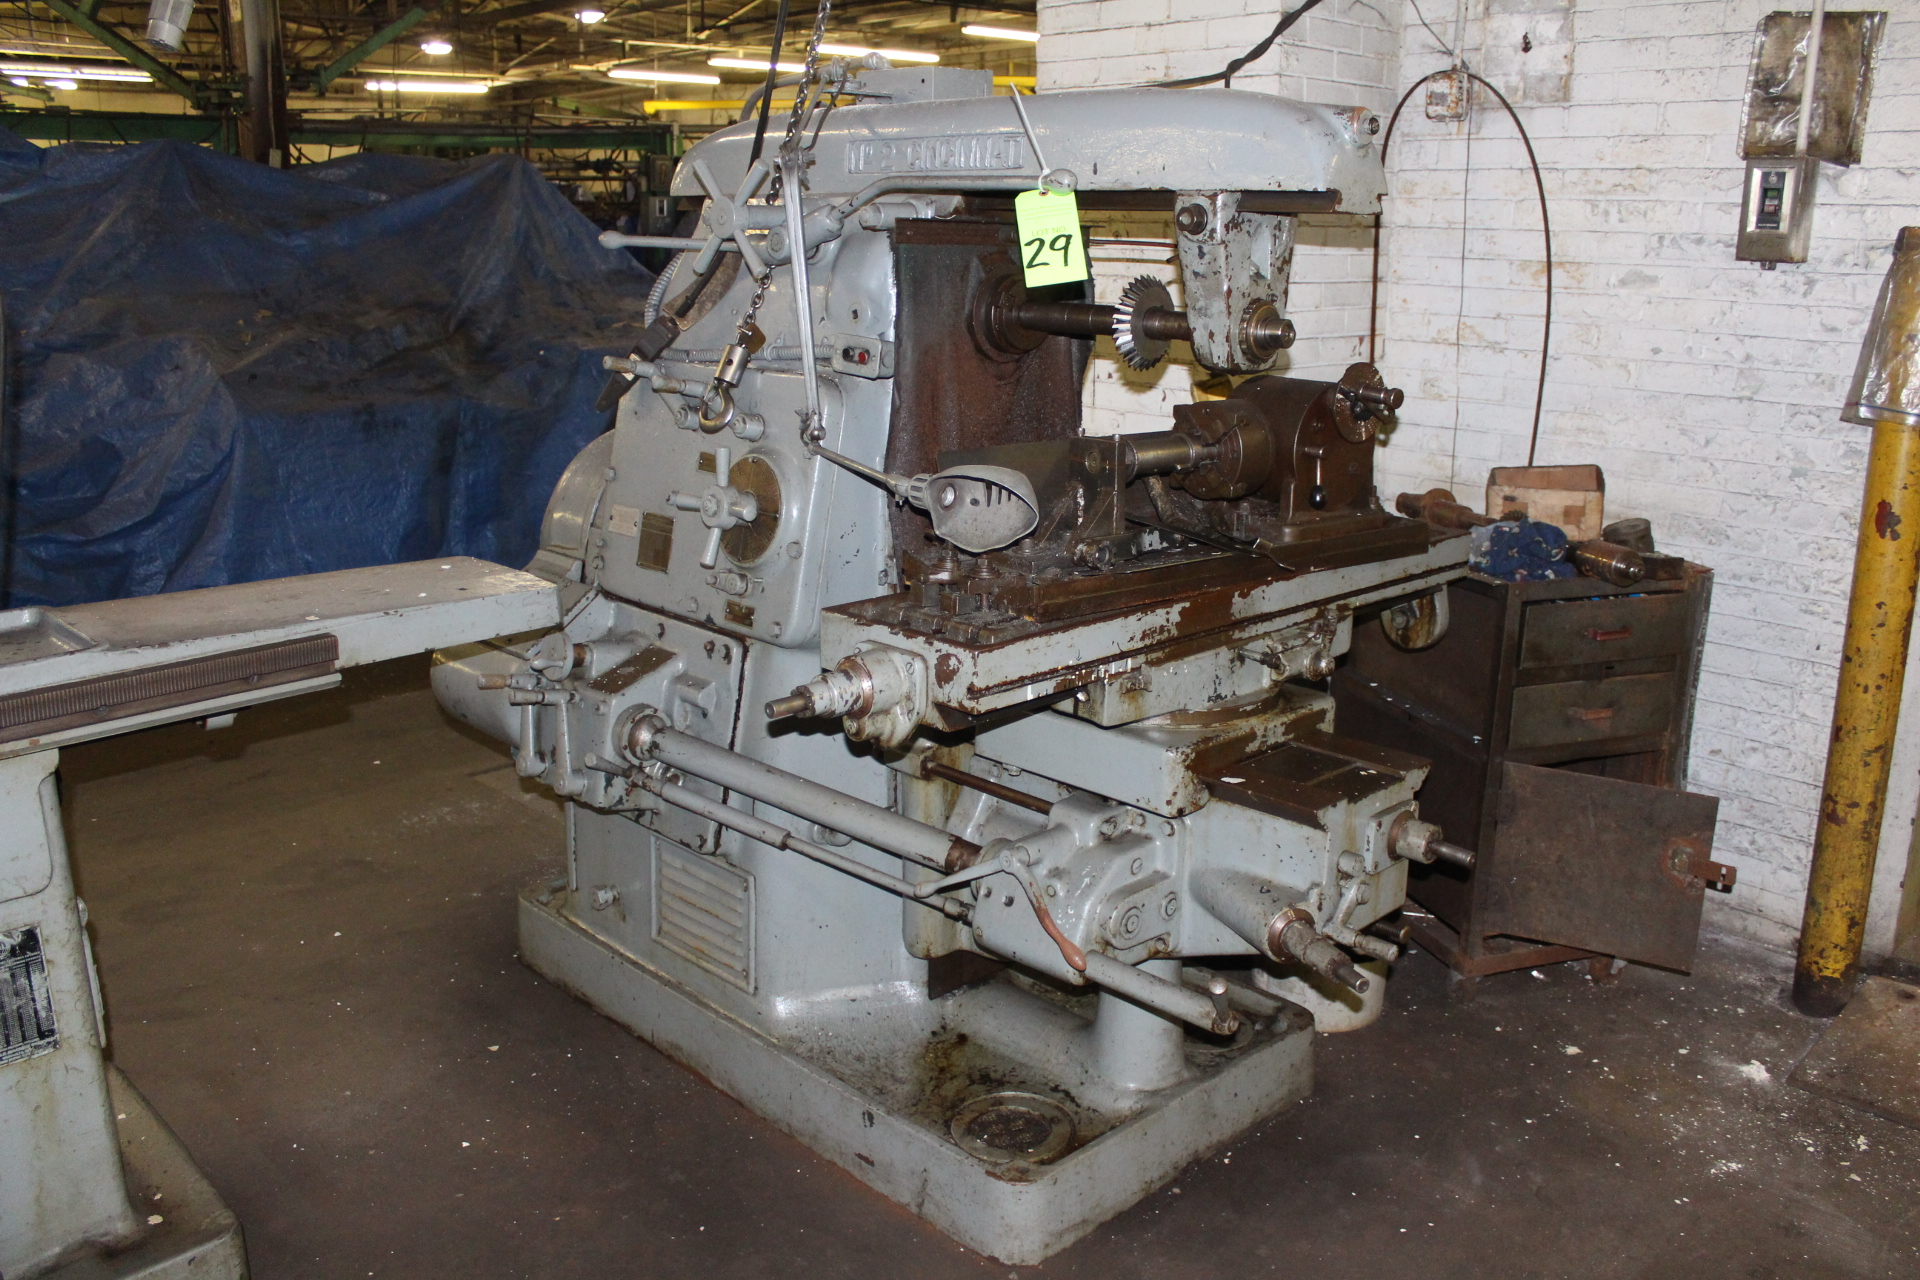 Lot 29 - Cincinnati No. 2 Universal Horizontal Milling Machine